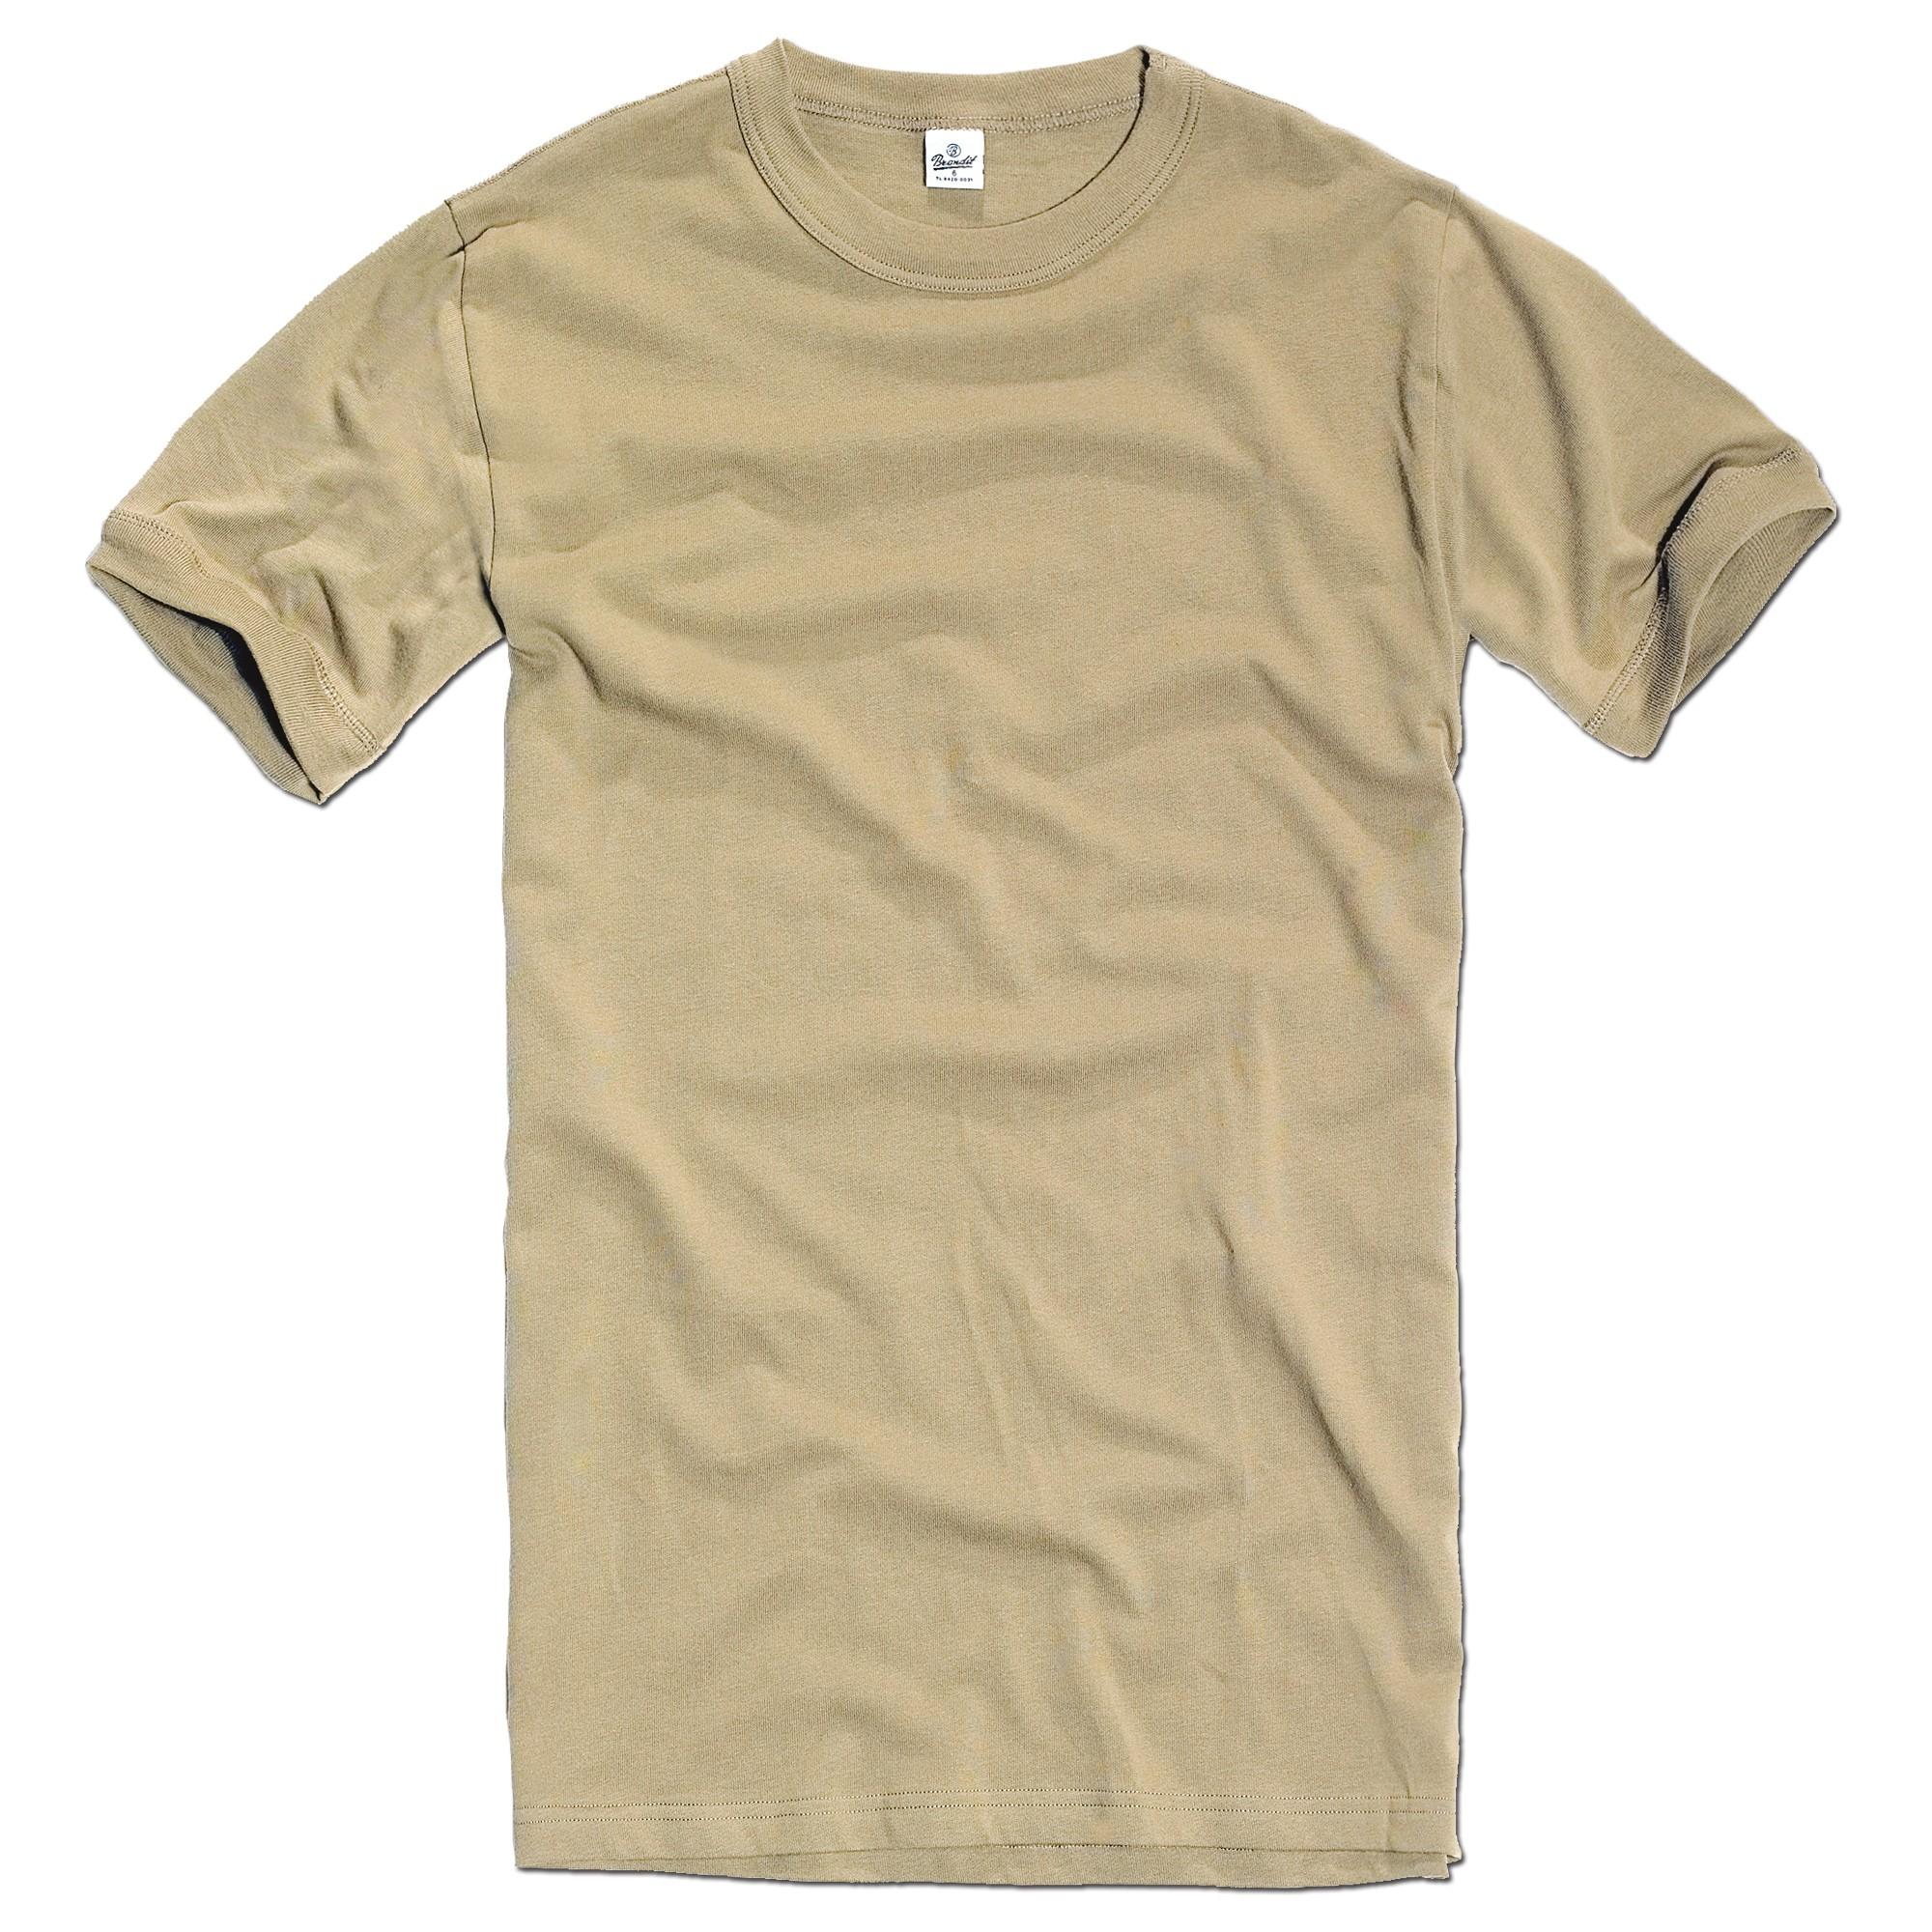 BW Unterhemd Brandit Original TL khaki